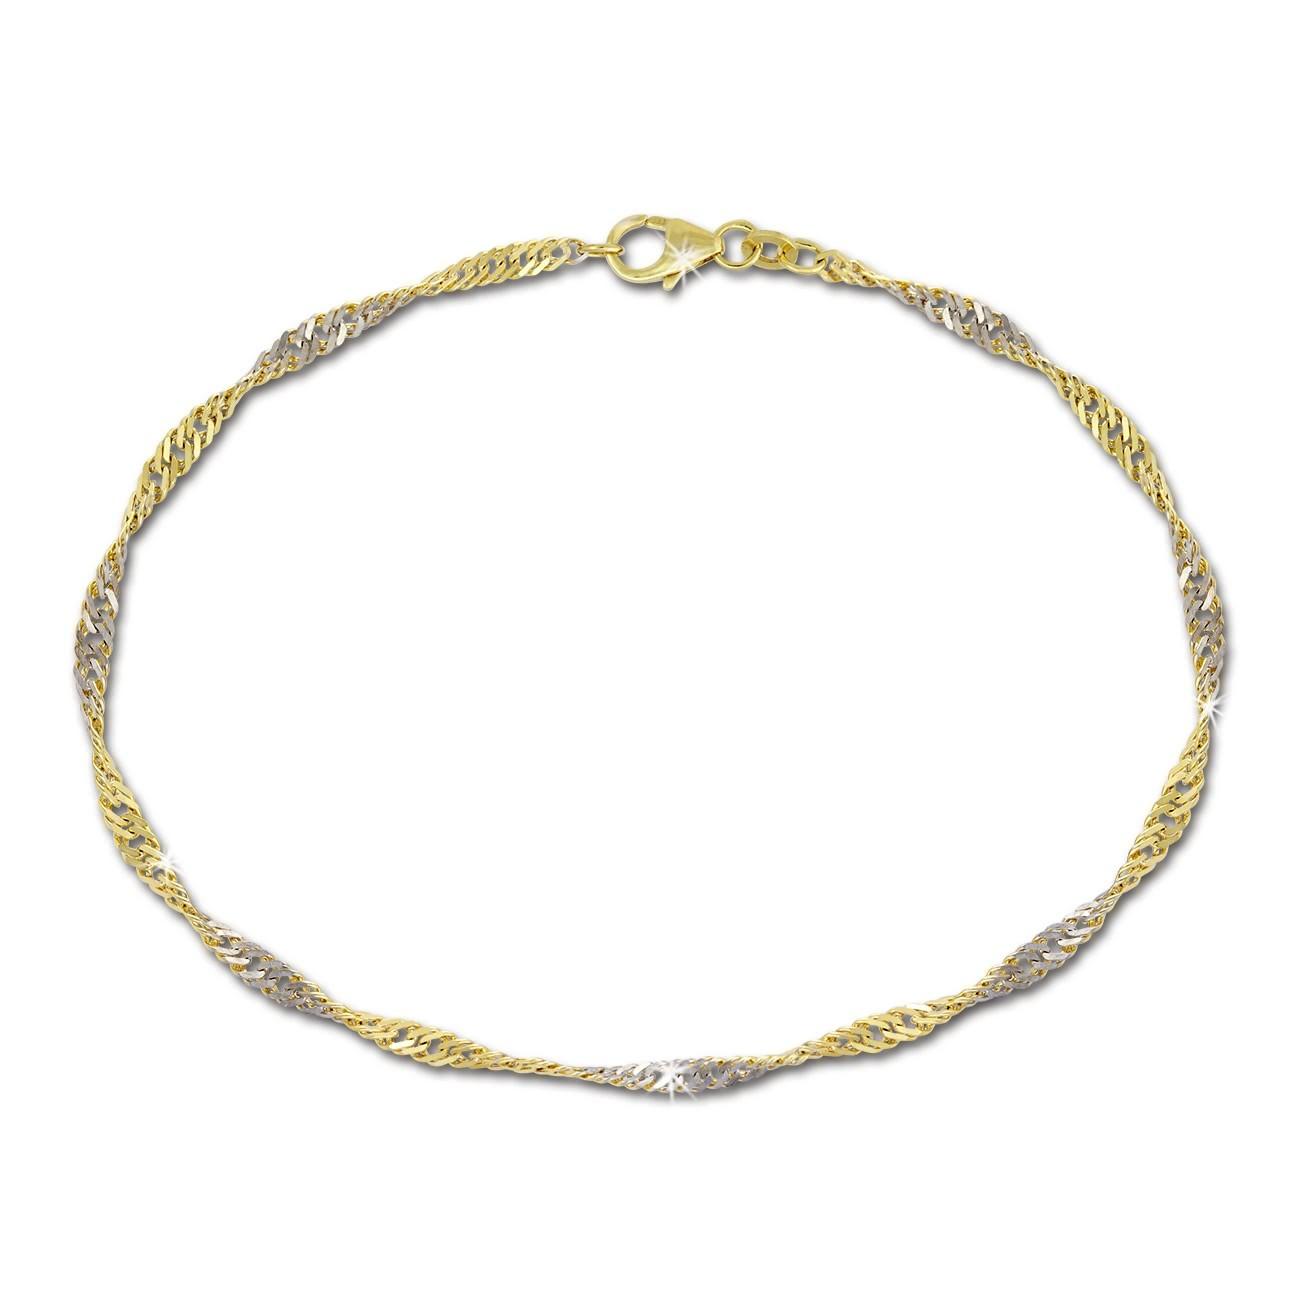 GoldDream Armband Singapur gedreht 333 Gold 19cm 8 Karat GDA0069Y